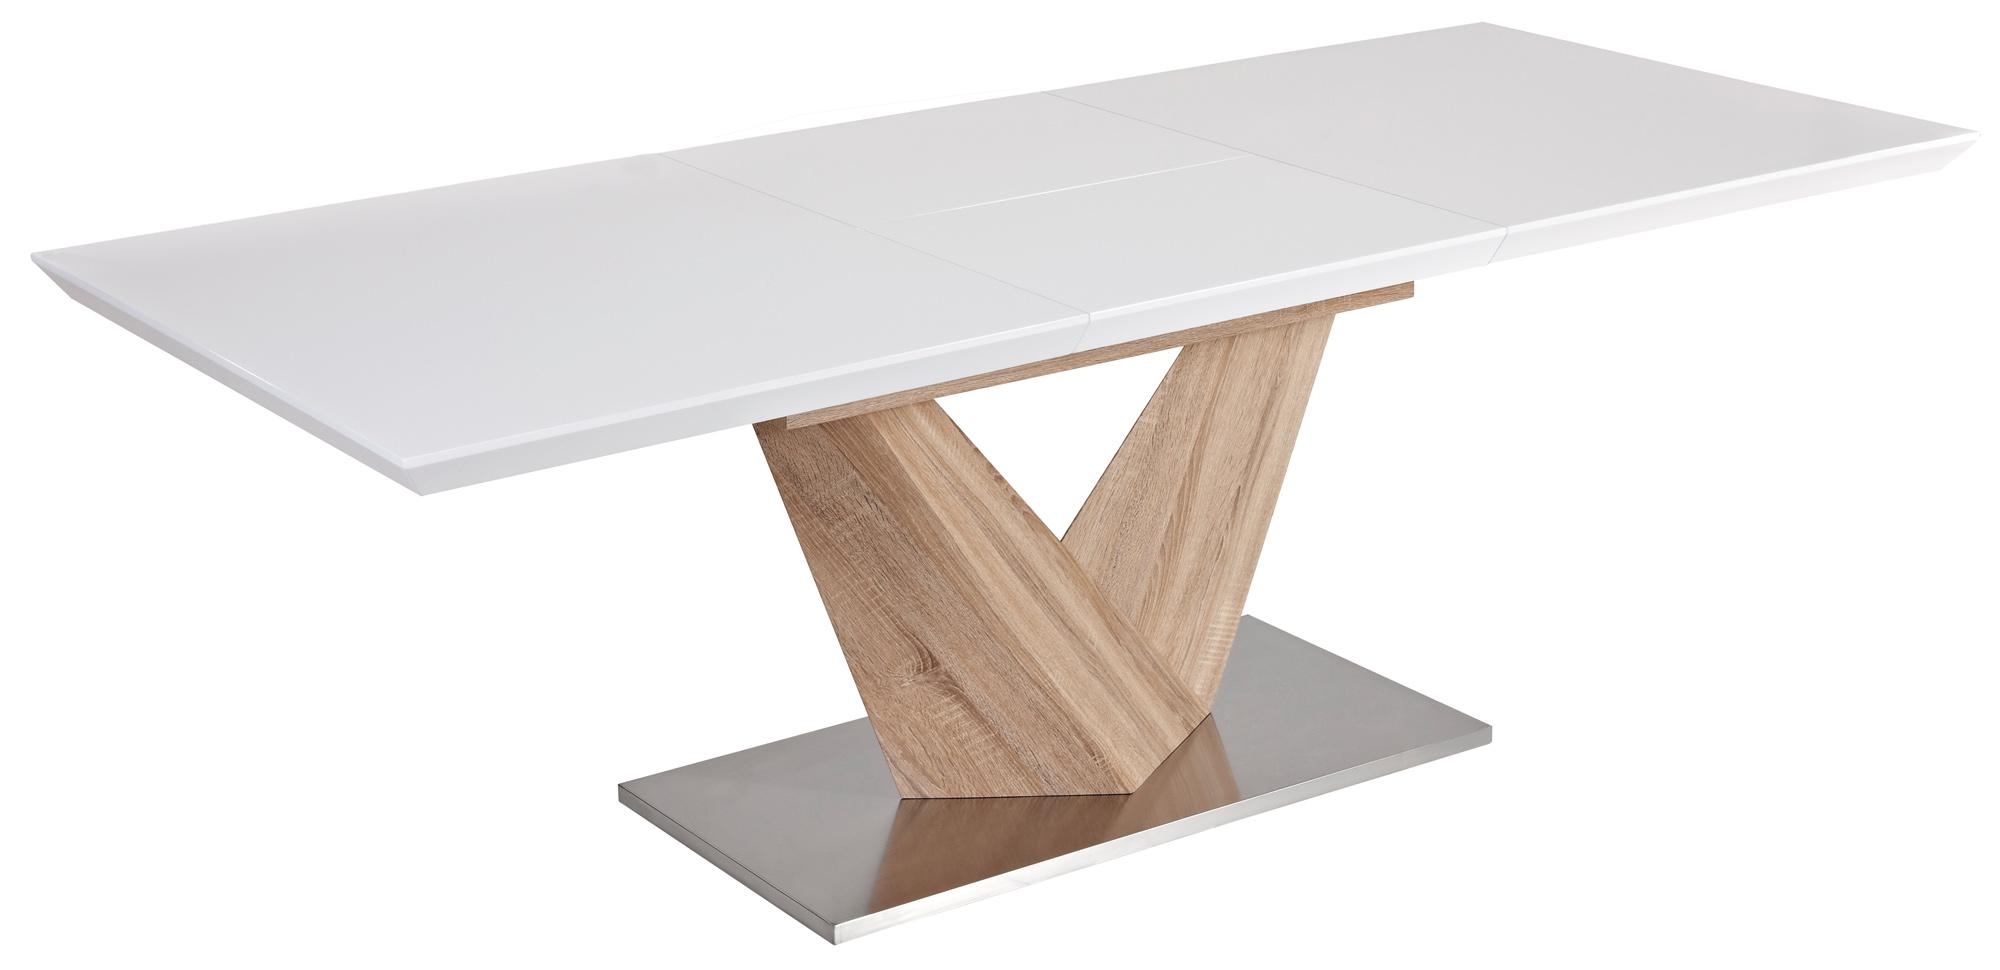 Signal Jedálenský stôl ALARAS stoly: 75 x 80 x 140 / 200 cm